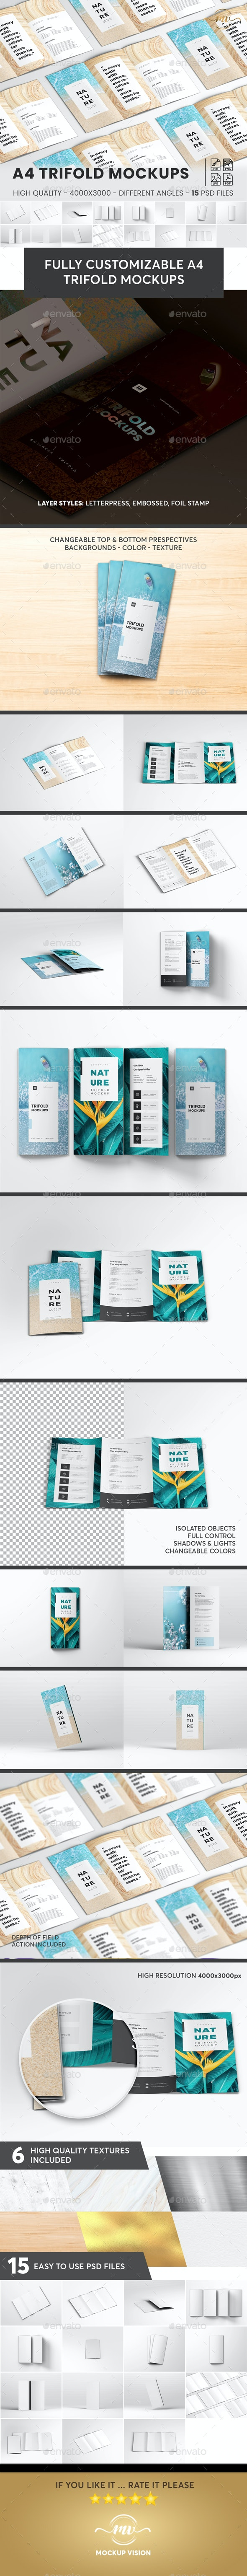 A4 Trifold Brochure Mockup V3 - Brochures Print